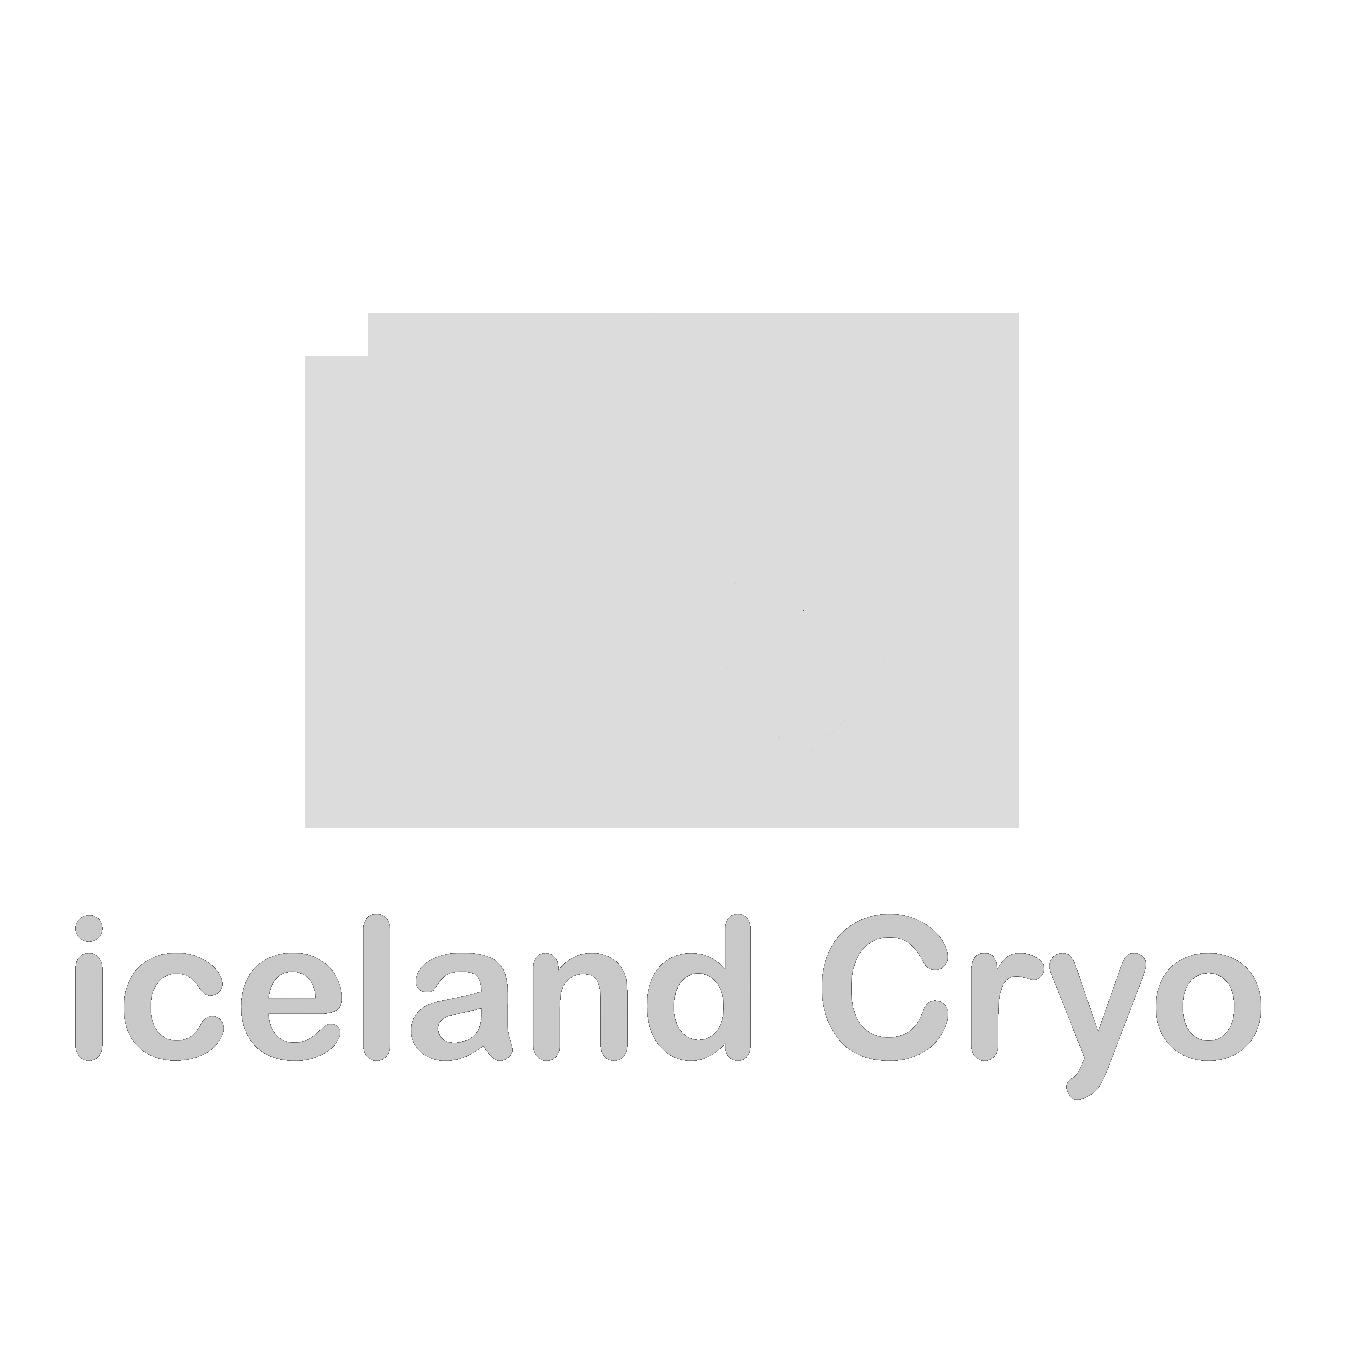 ICELANDCRYO WEBSITE.png